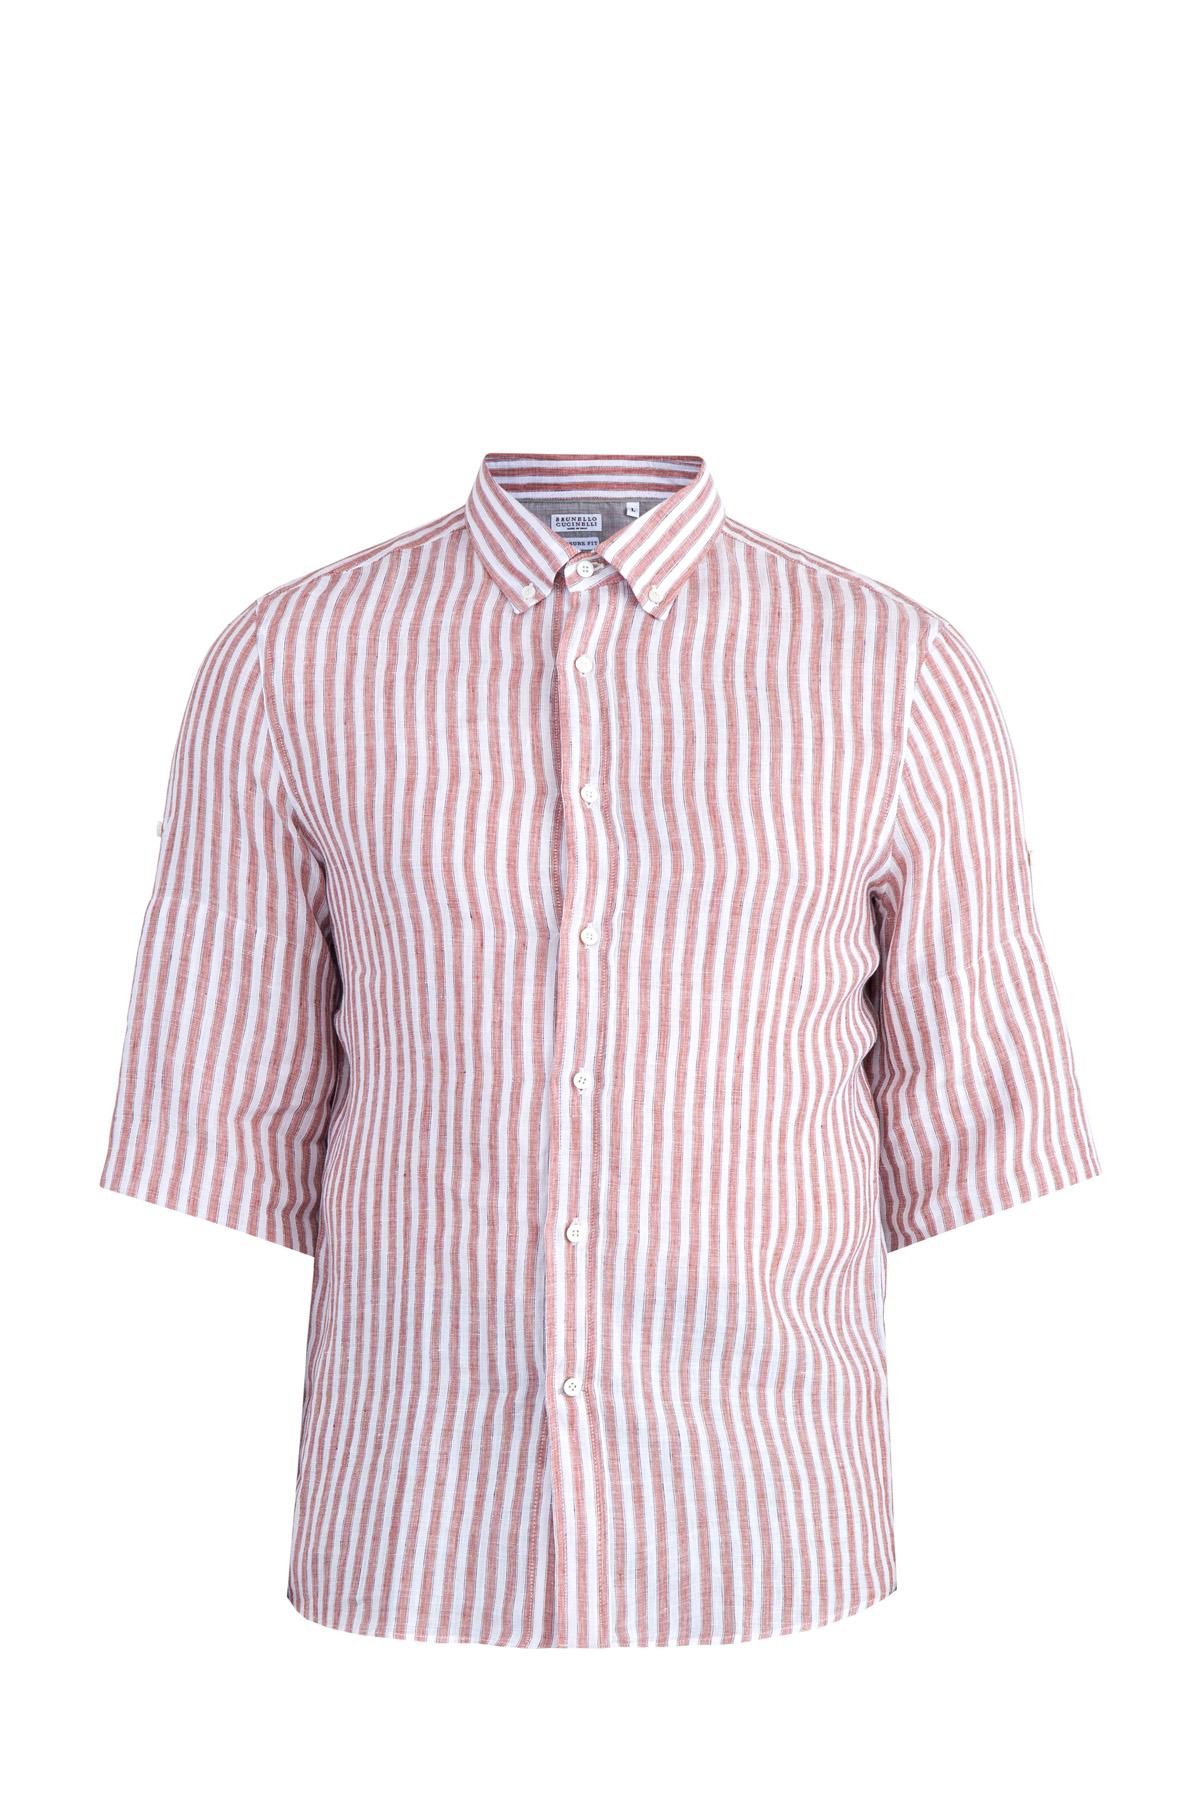 Купить Рубашка в неформальном стиле Leisure с короткими рукавами, BRUNELLO CUCINELLI, Италия, лен 100%